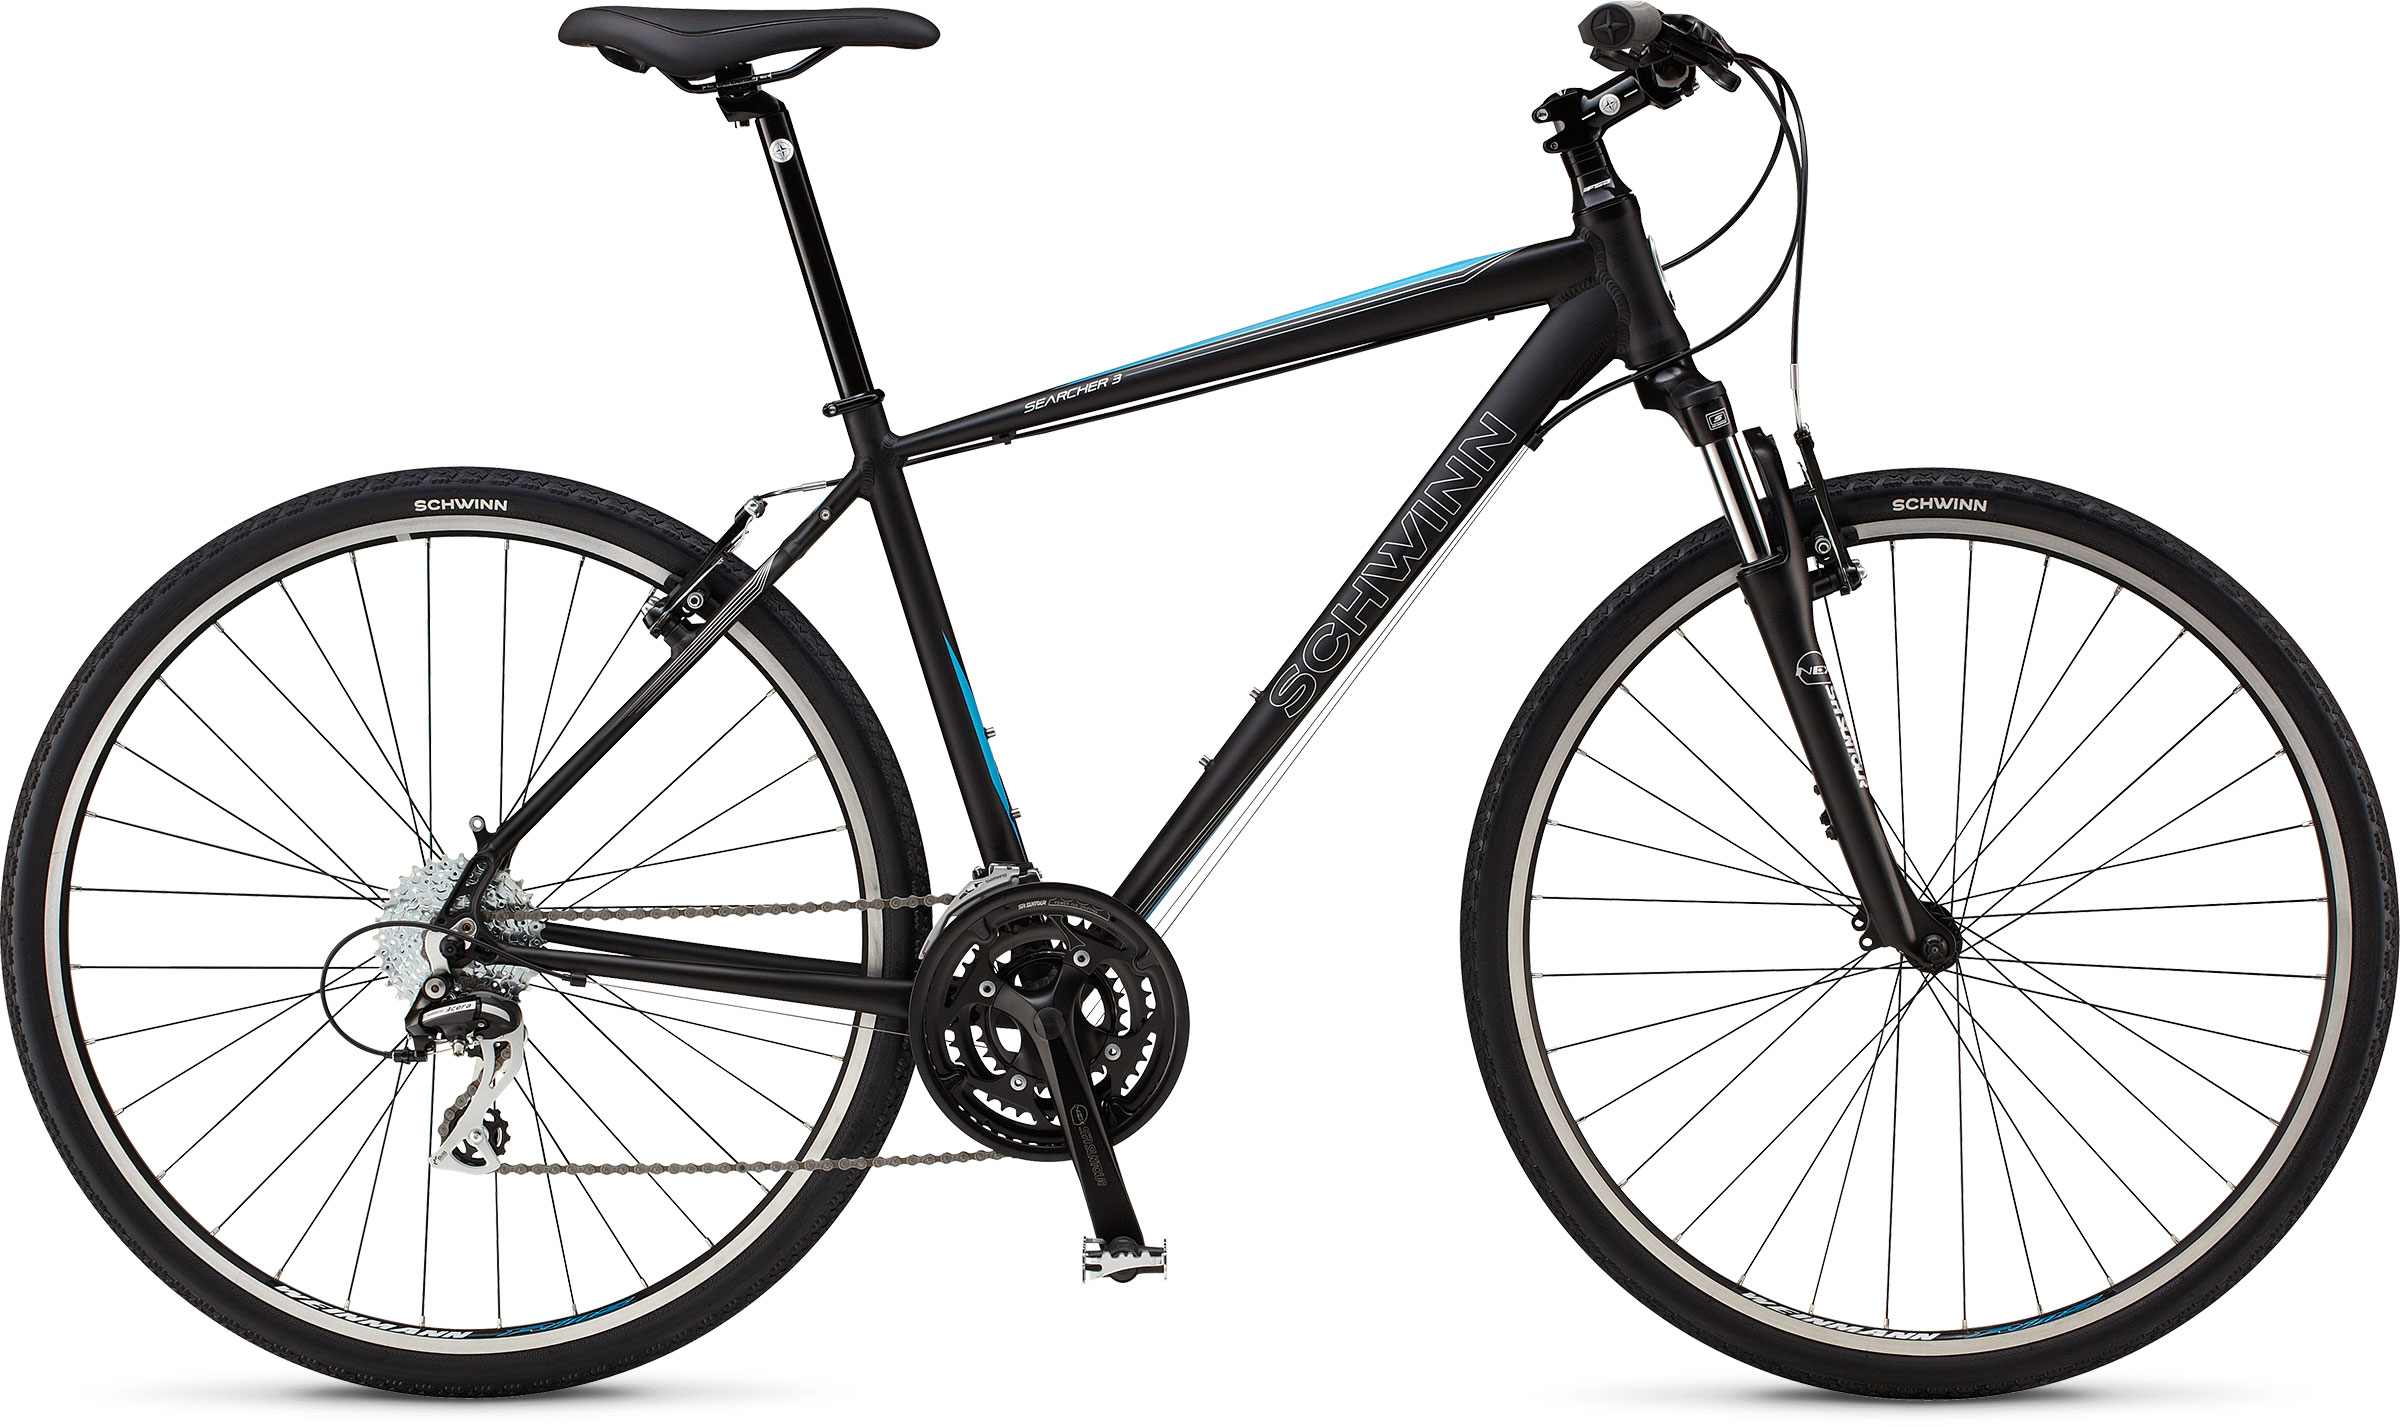 c2faeaa51d3 Schwinn Searcher 3 - J-Town Bike, Bicycle Sales and Repair Shop ...